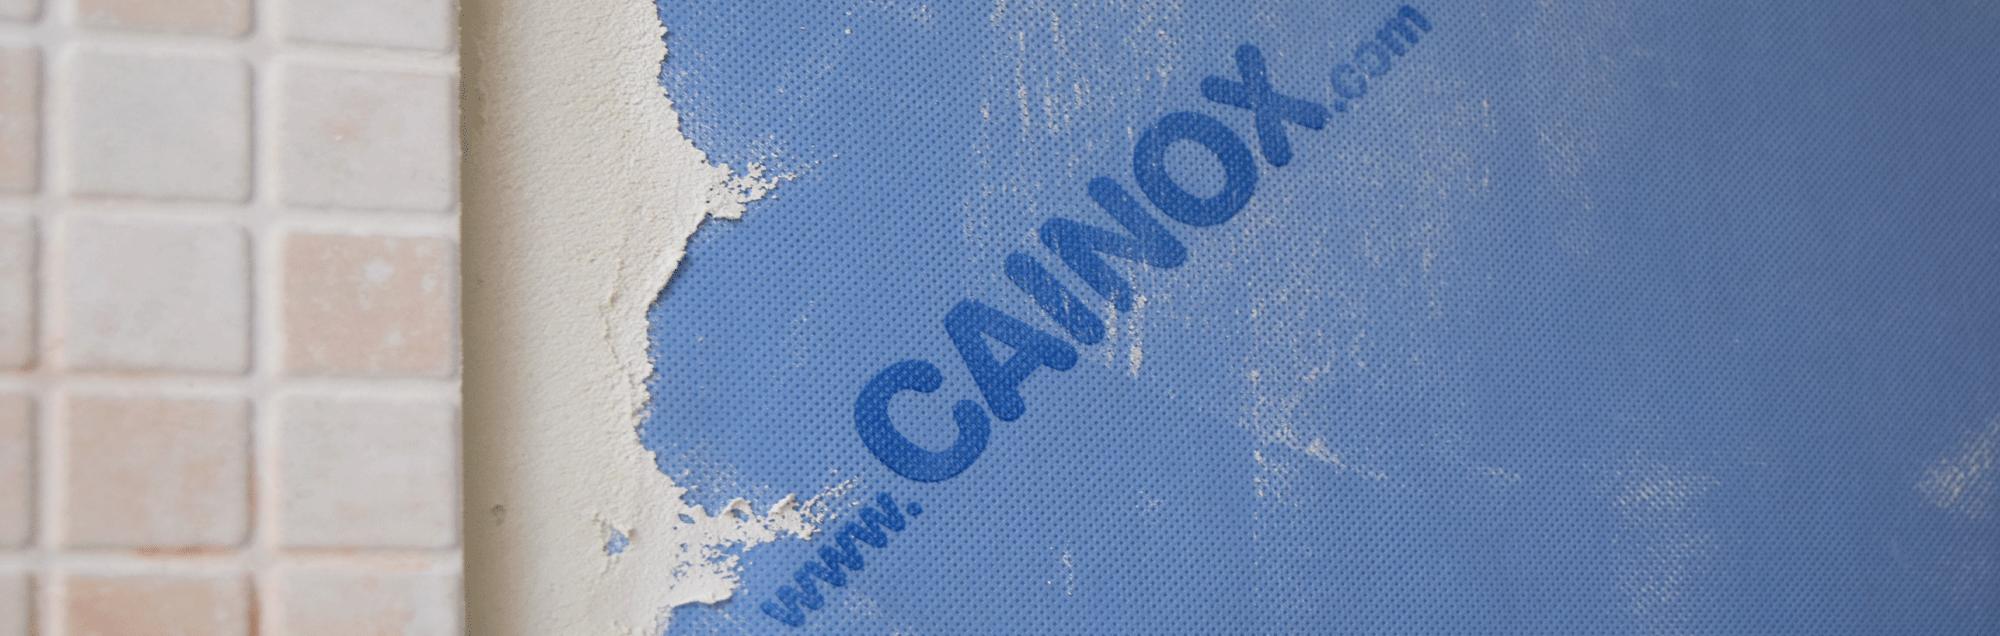 tela-sky-impermeabilizante-cainox-01